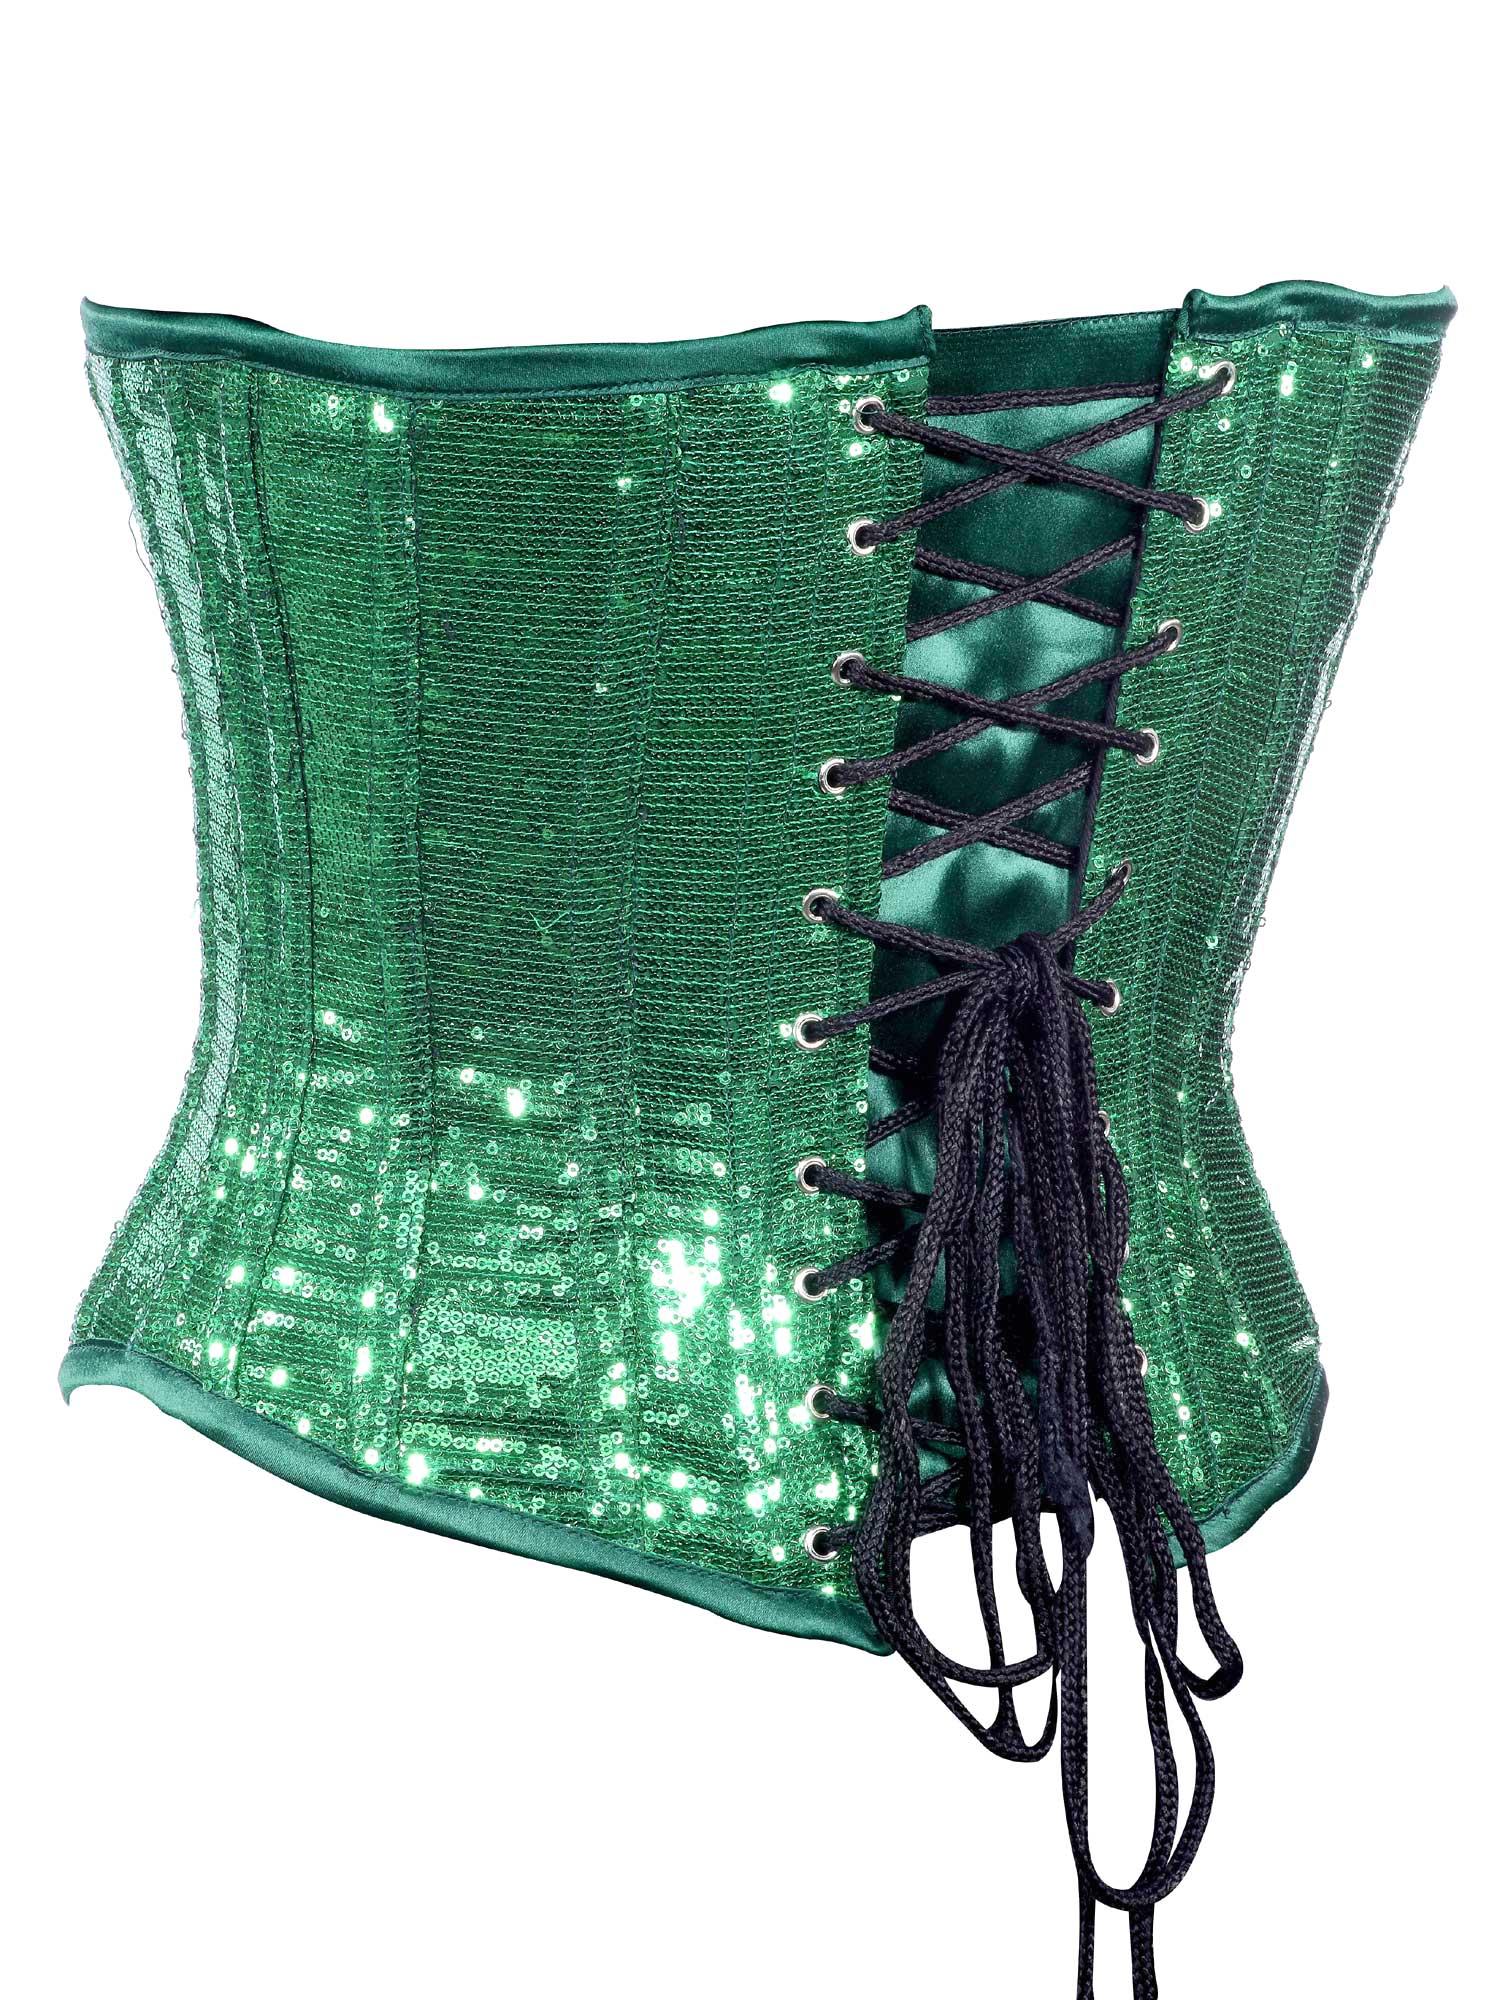 green_sequin_fabric_steel_boning_underbust_corset_waist_cincher_bustier_bustiers_and_corsets_3.jpg